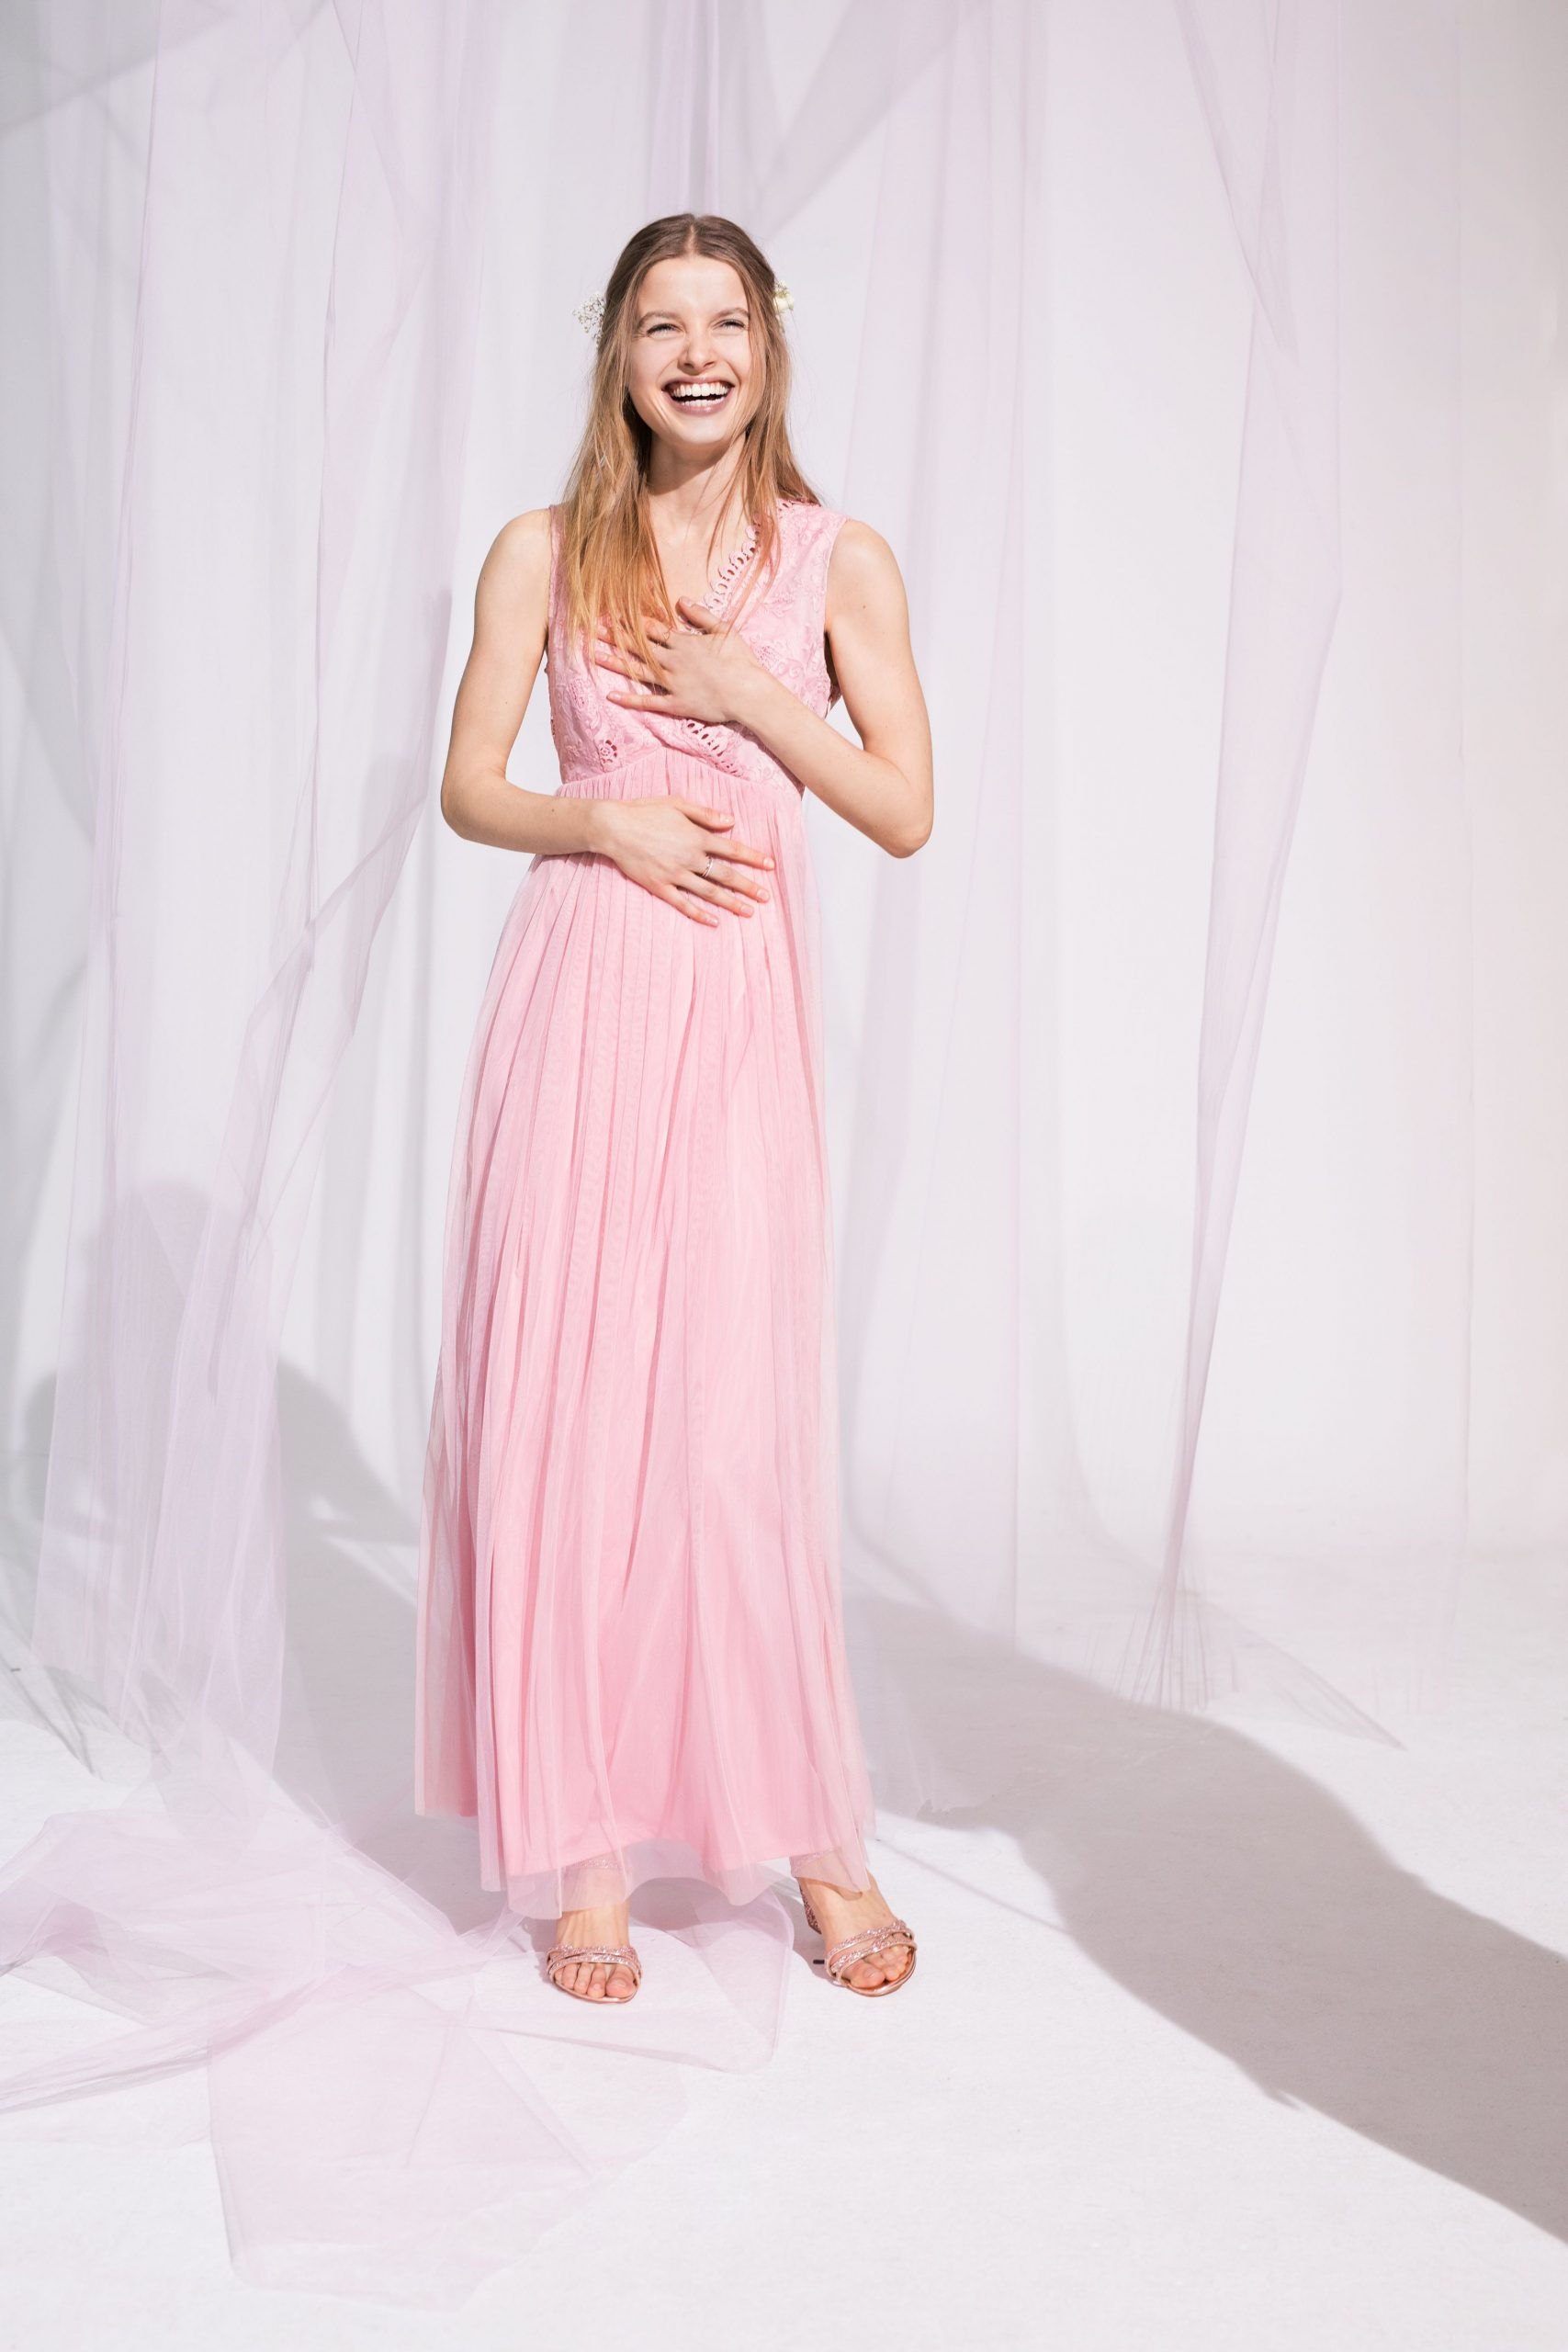 Abend Luxurius Abendkleid About You Bester PreisFormal Leicht Abendkleid About You Design